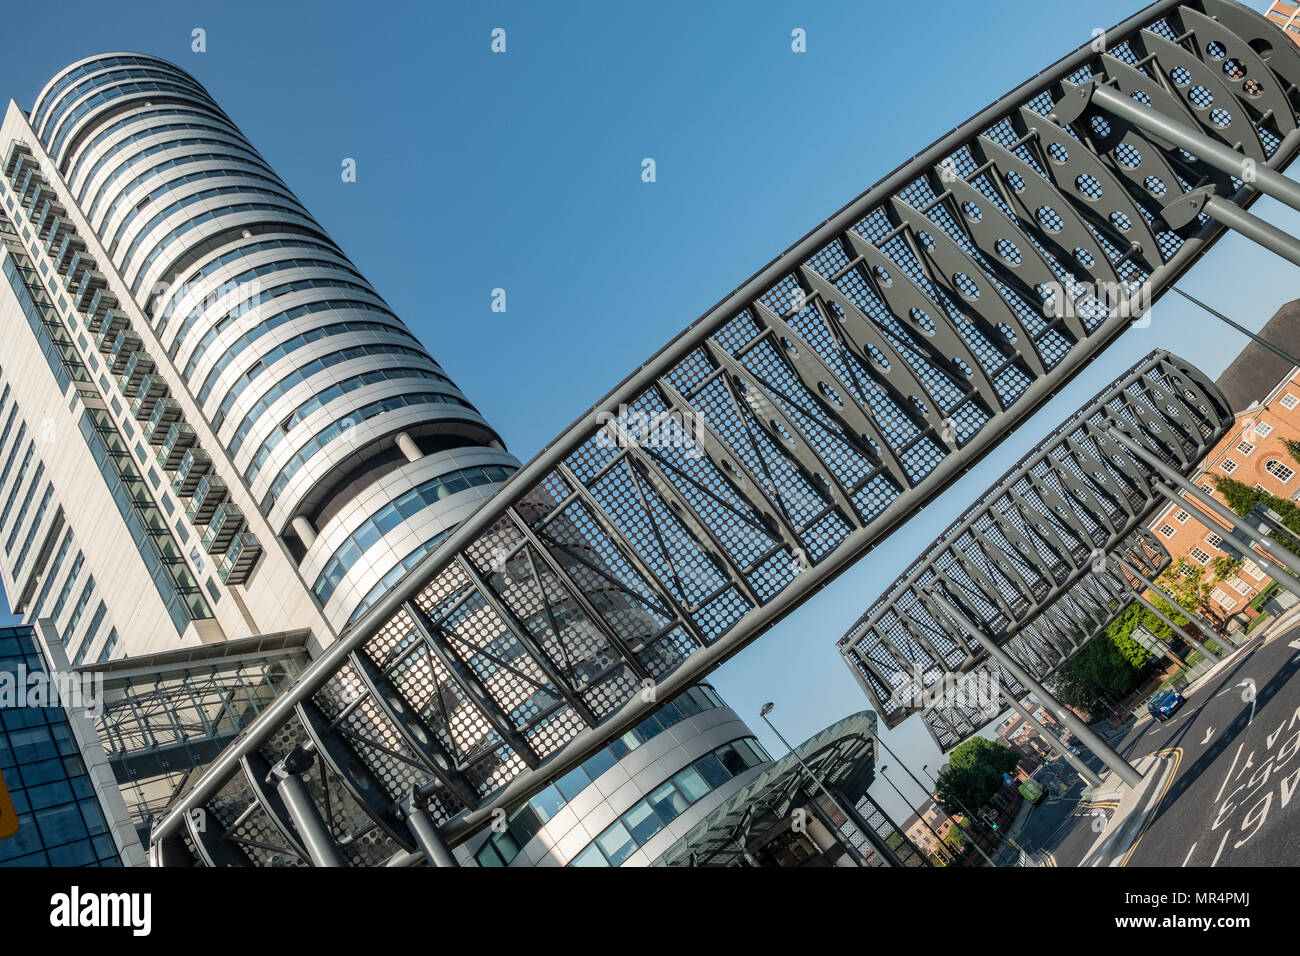 Giant Wind Deflectors or Baffles outside Bridgewater Place, Leeds, West Yorkshire, England - Stock Image